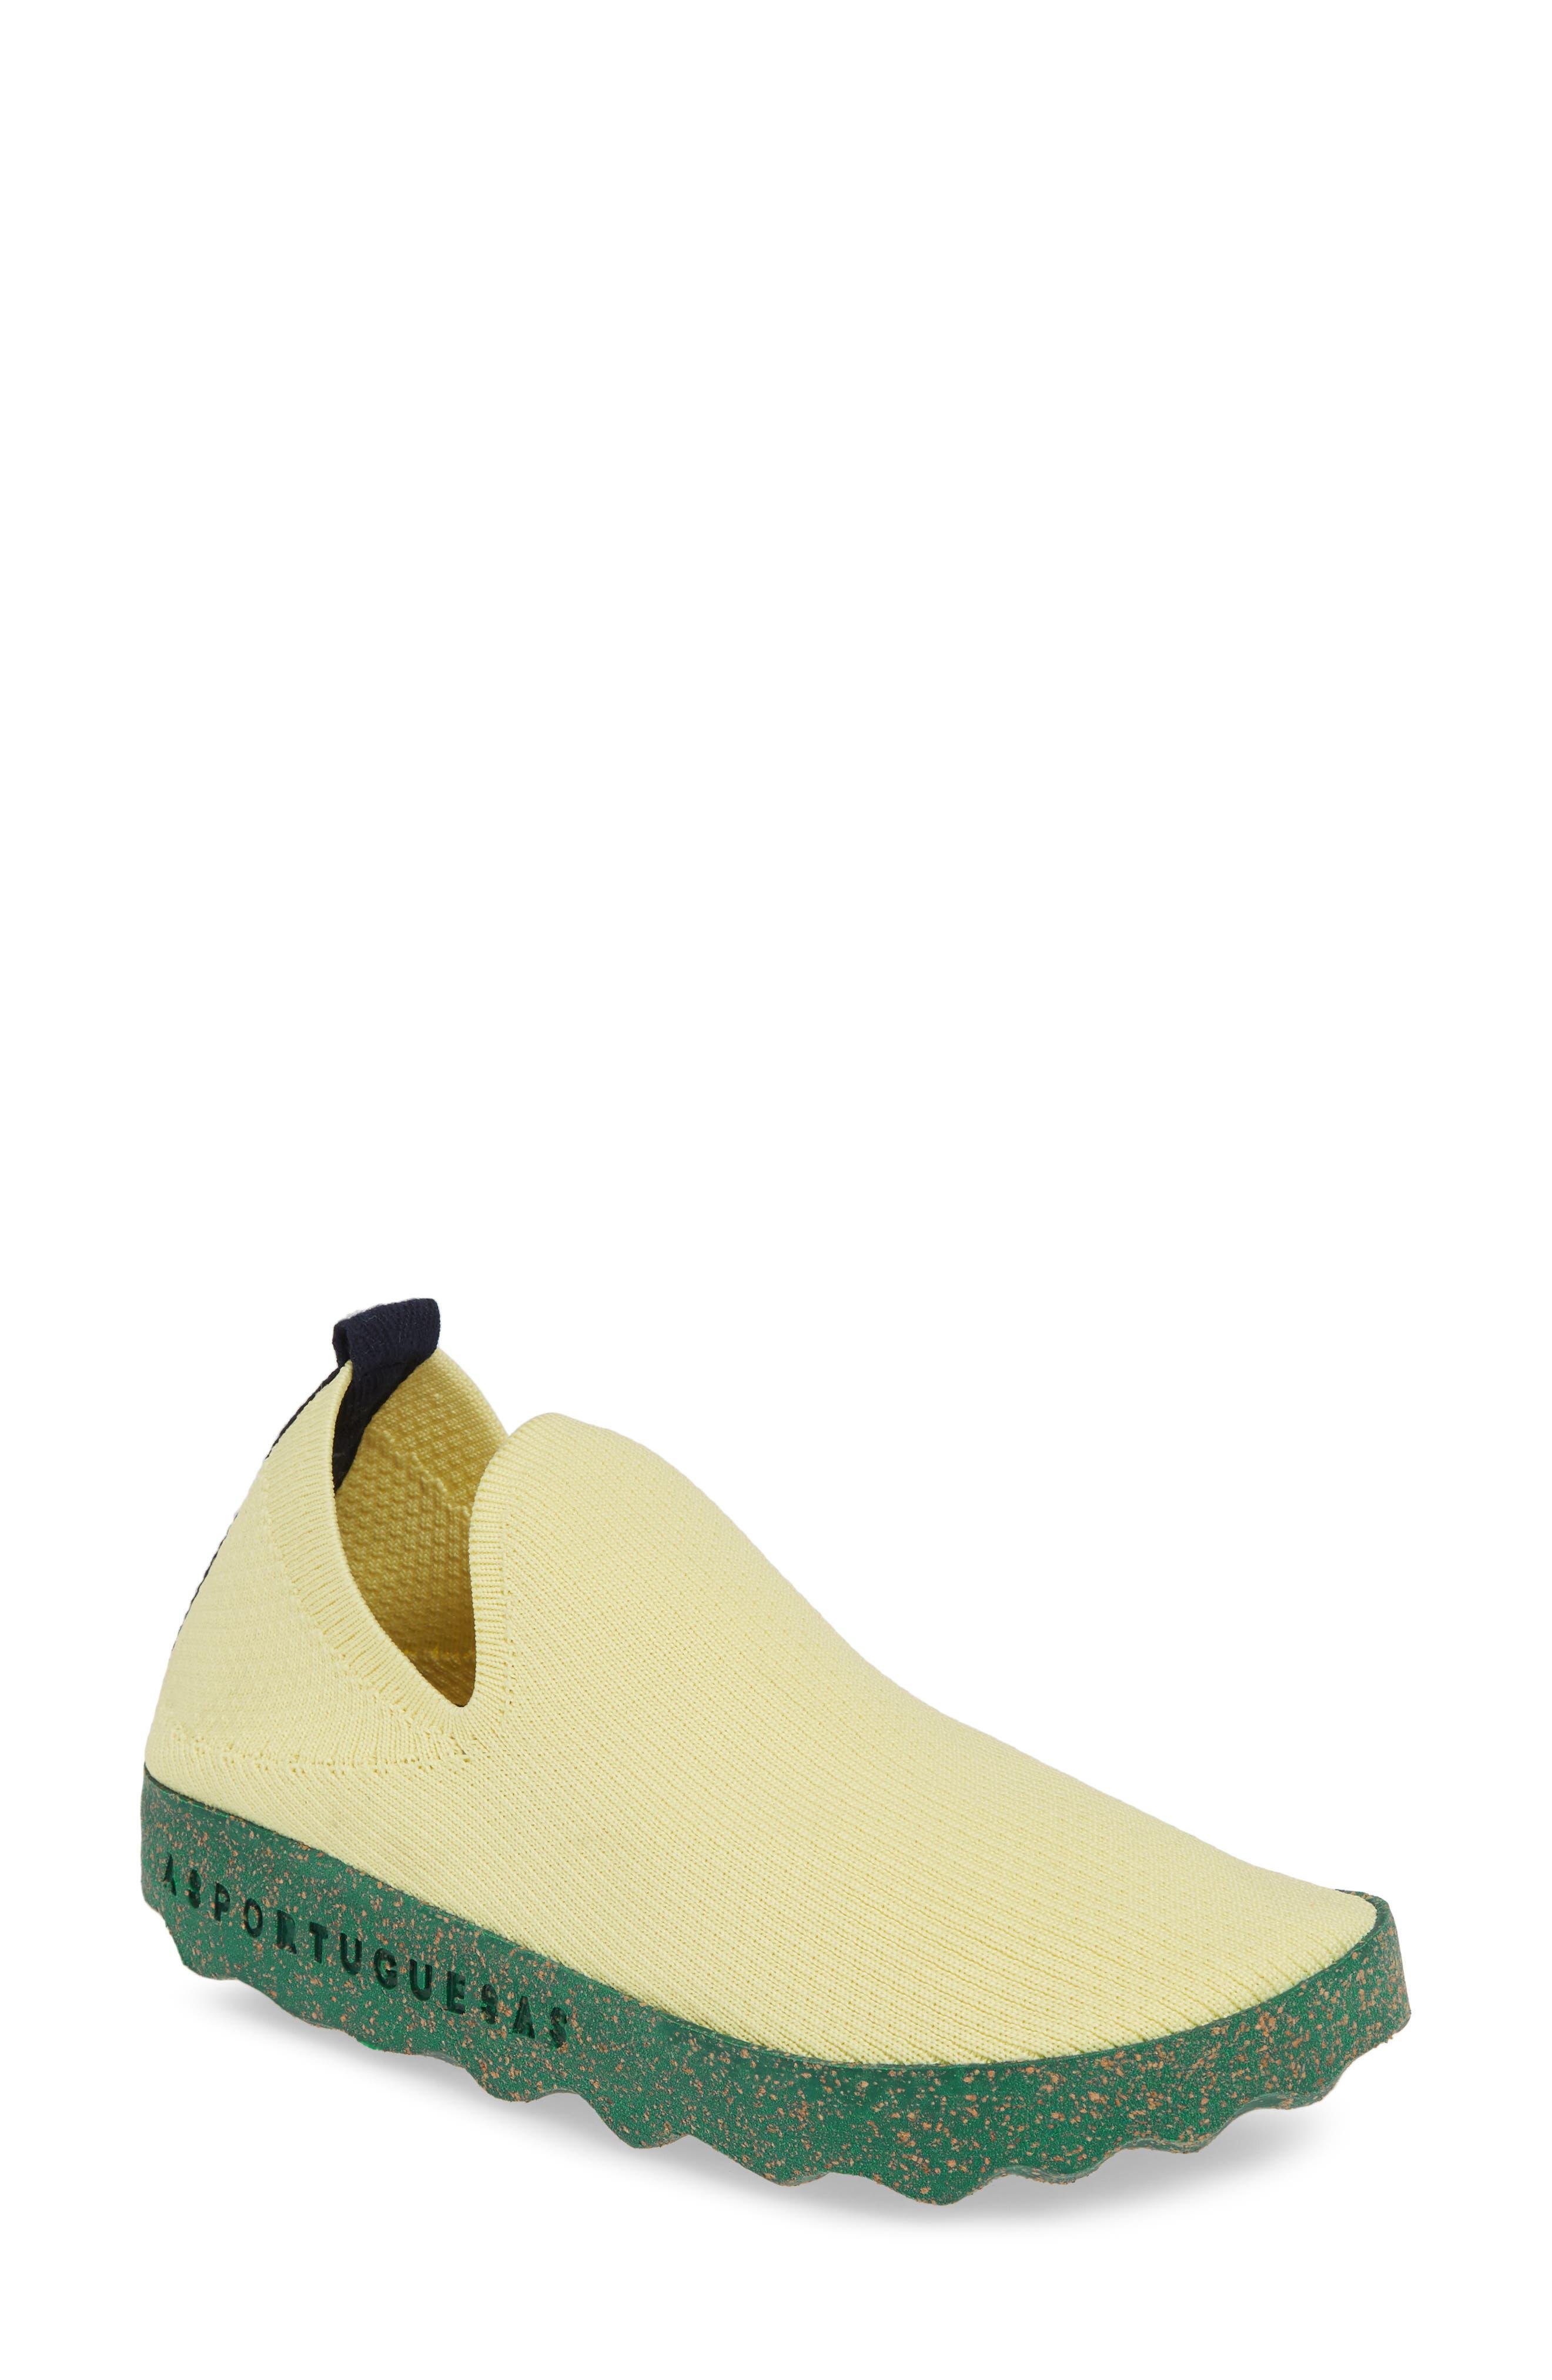 Asportuguesas By Fly London Care Sneaker, Yellow